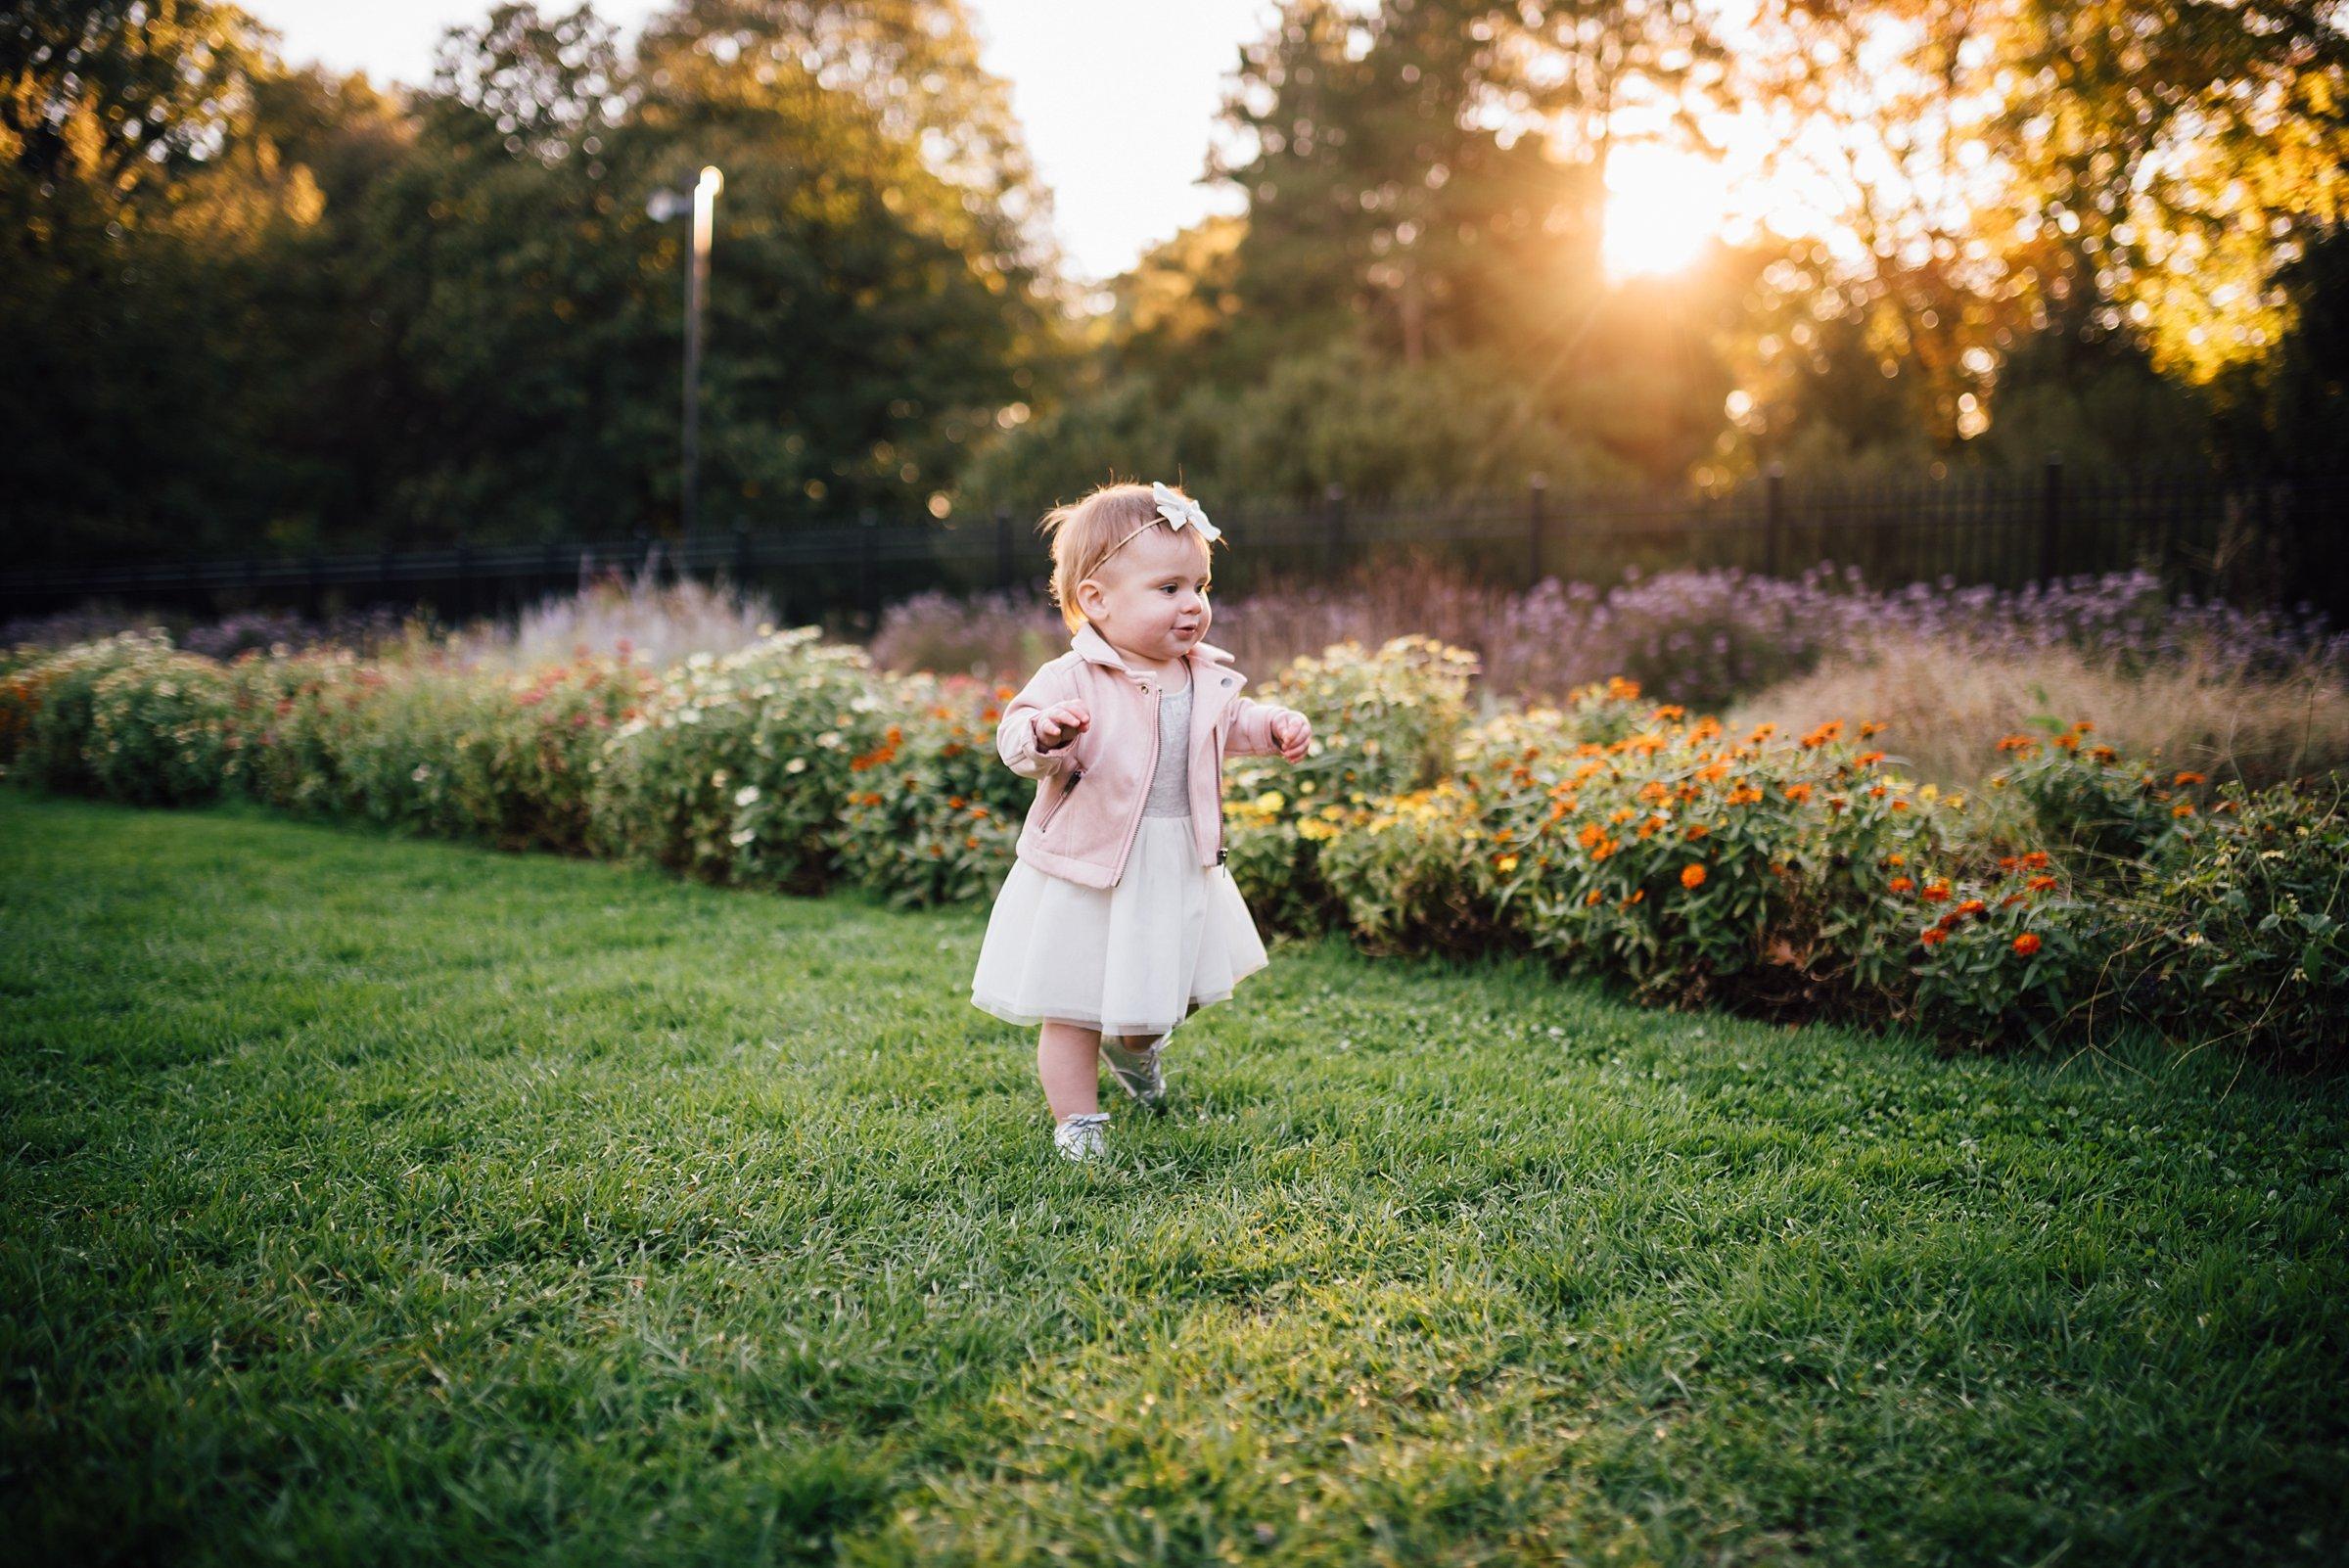 Family Photography Hartwood Acres Mansion Pittsburgh Rachel Rossetti_0308.jpg